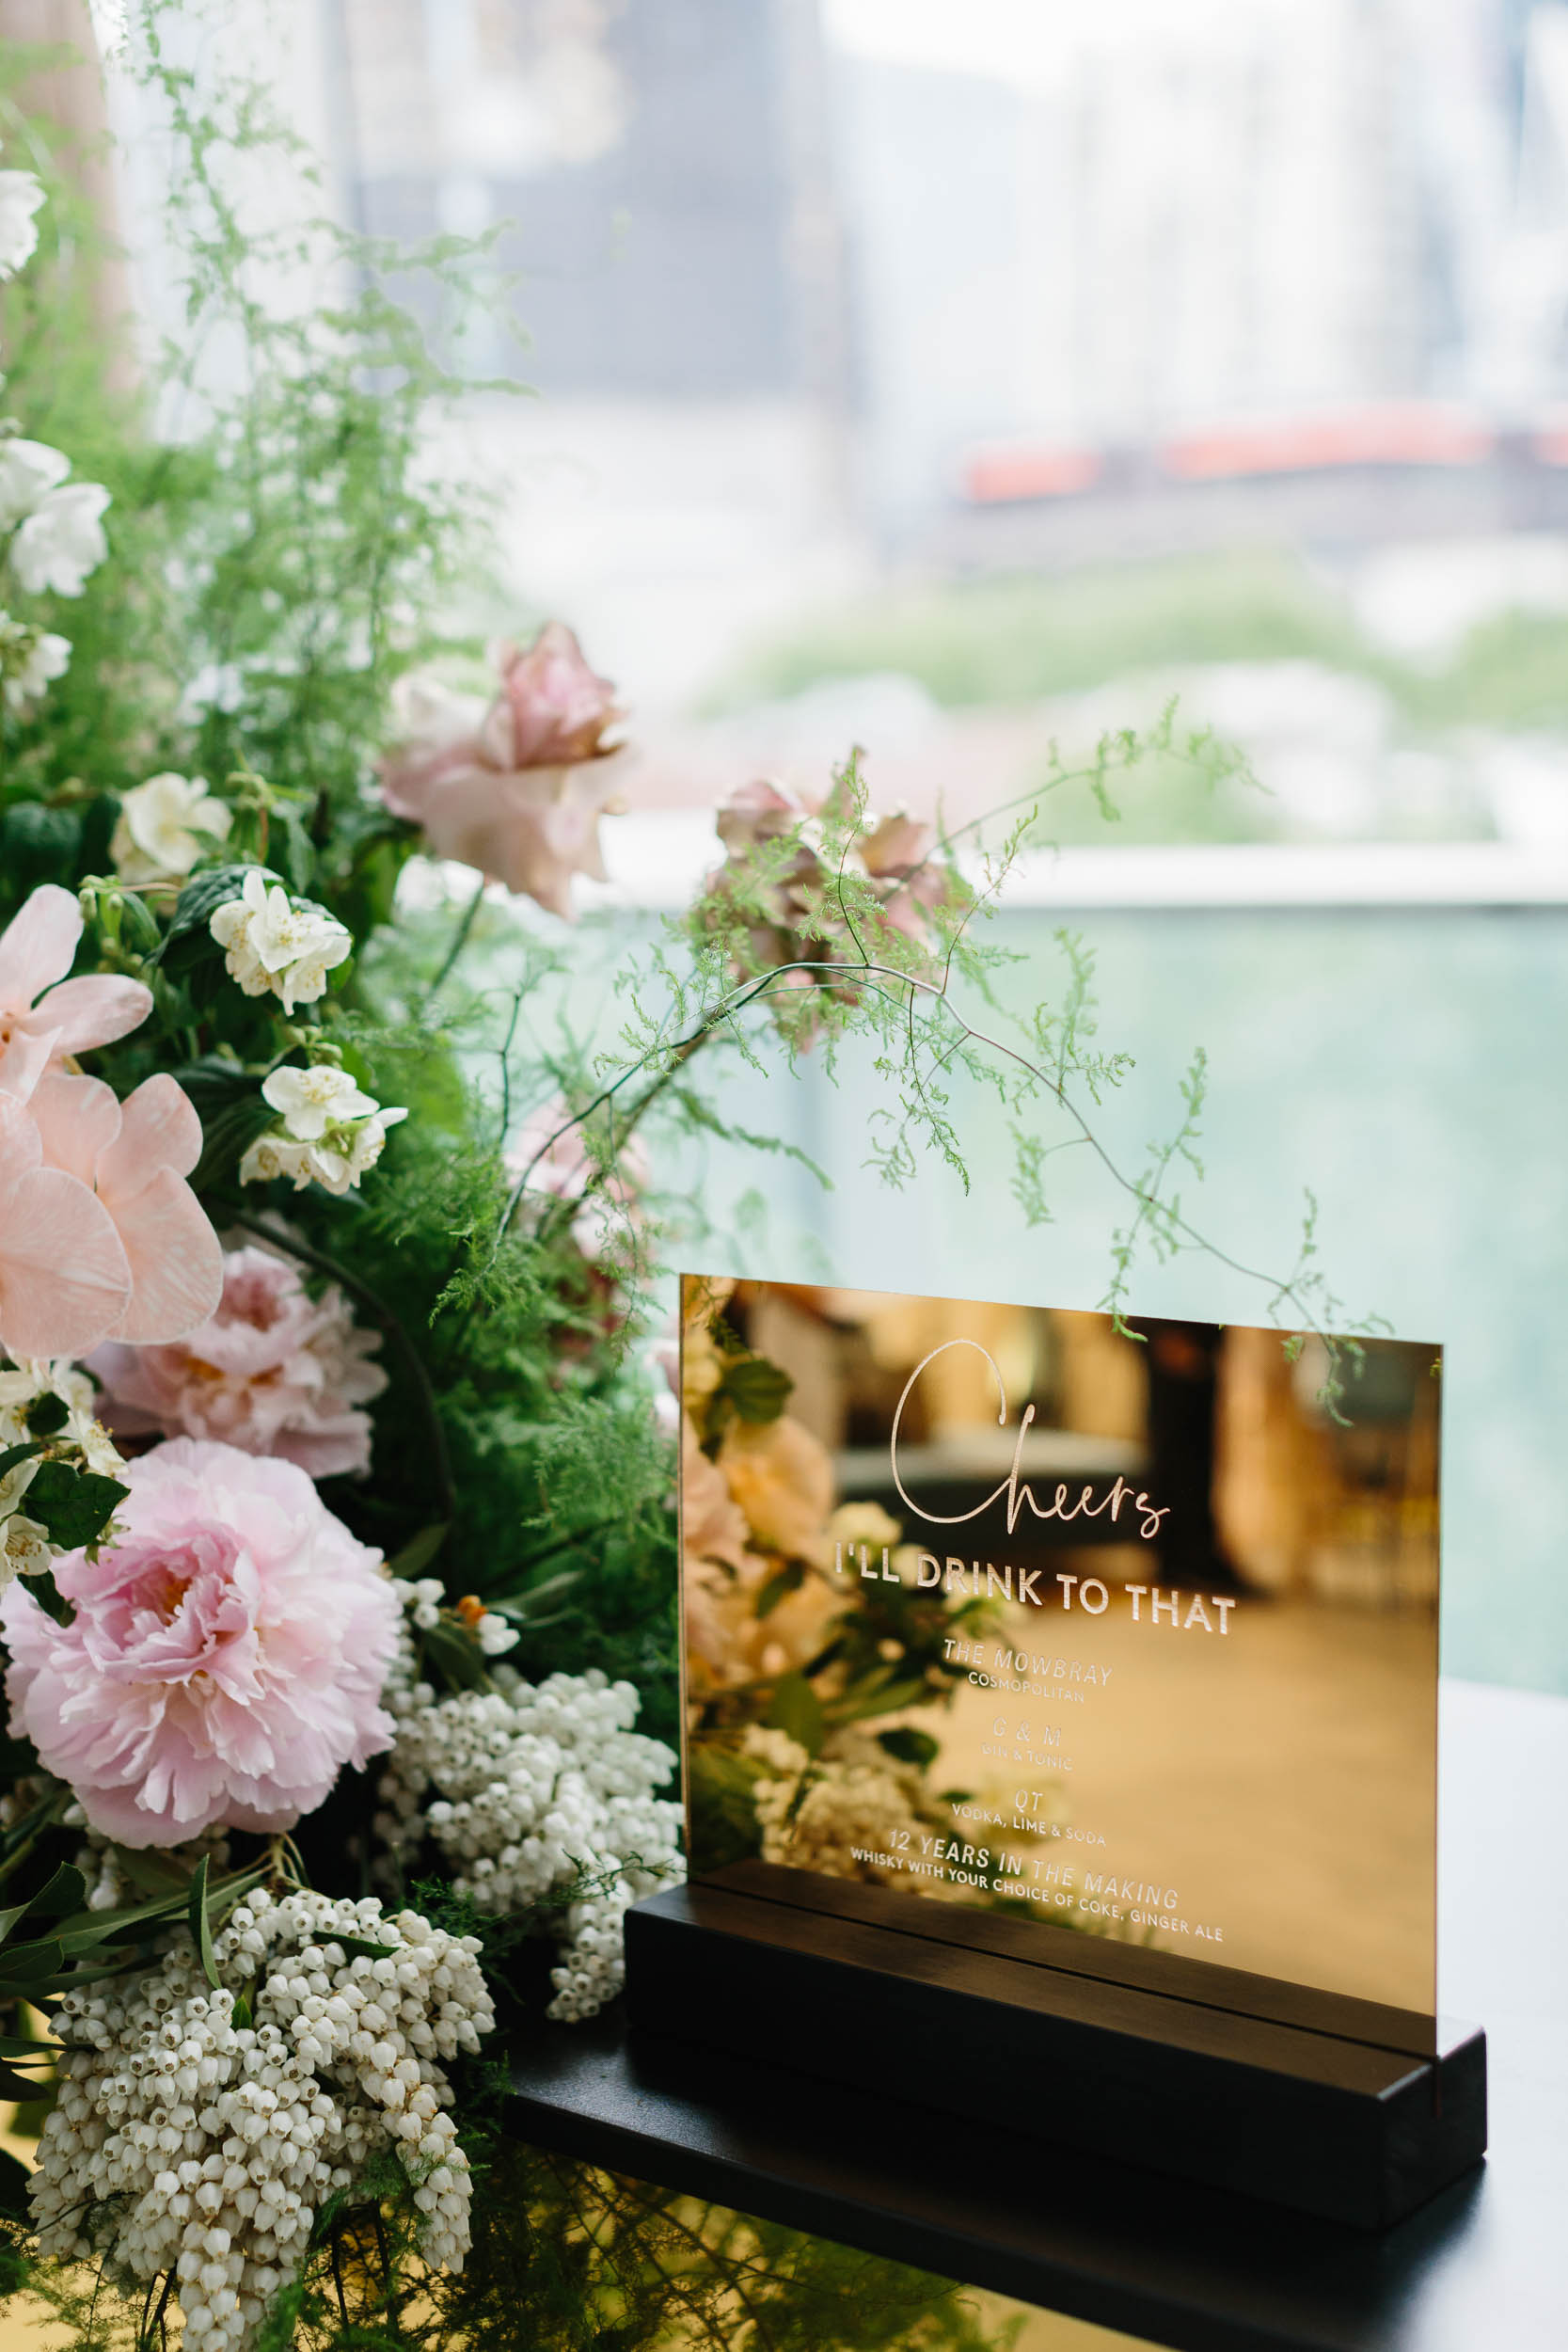 Kas-Richards-Wedding-Photographer-Melbourne-City-Wedding-Alto-Event-Space-Jane-Hill-Bridal-Gown-44.jpg